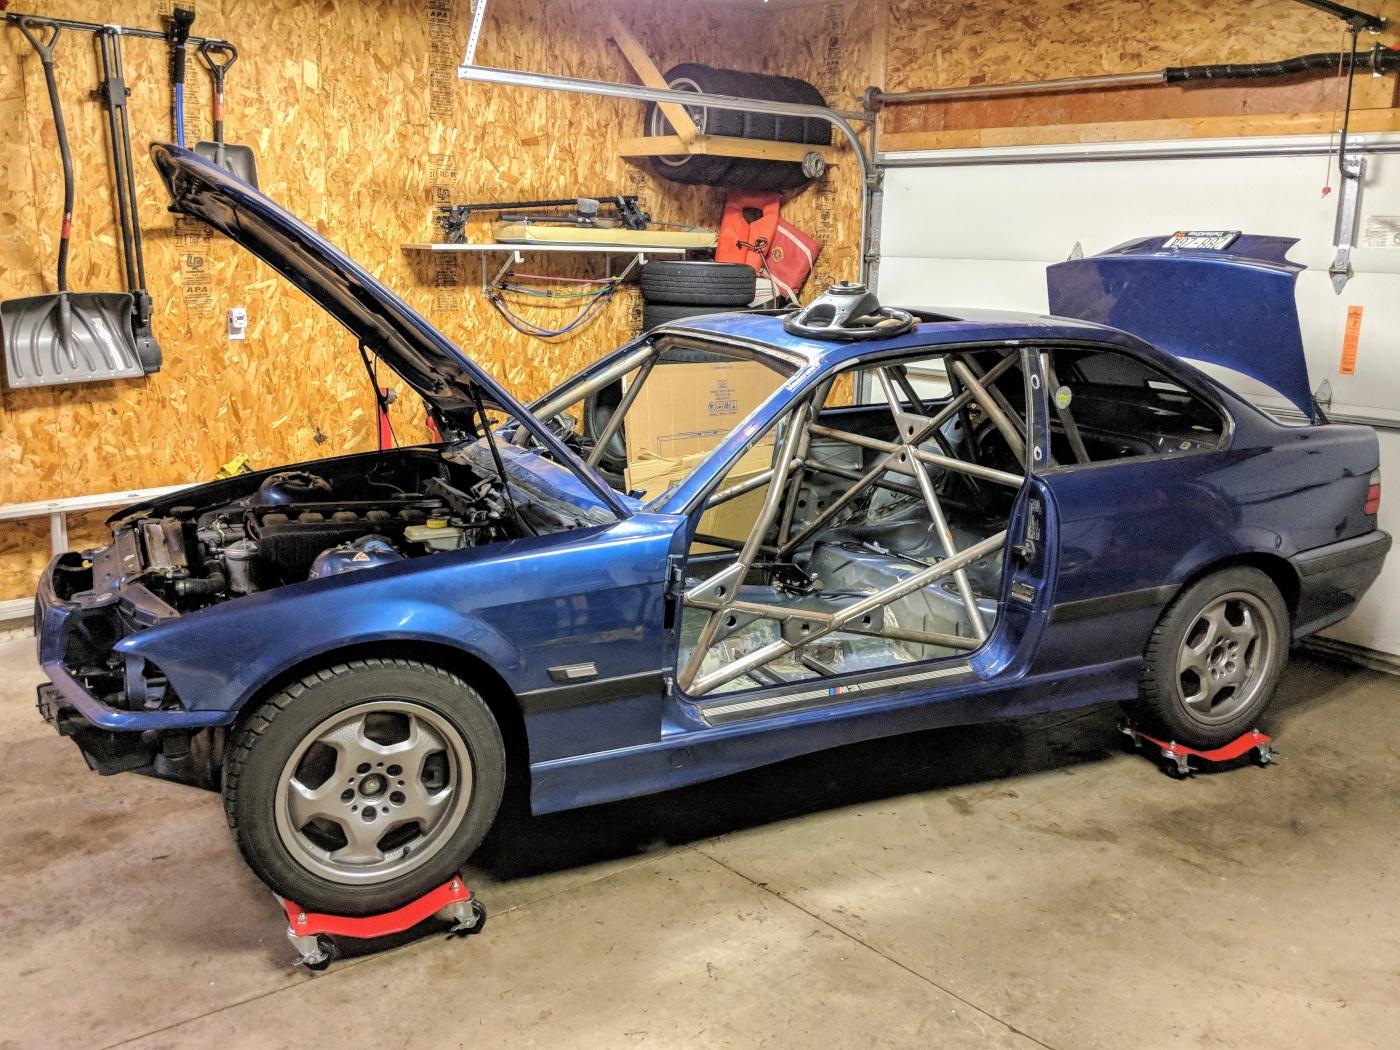 bmw-e36-caged-rally-car